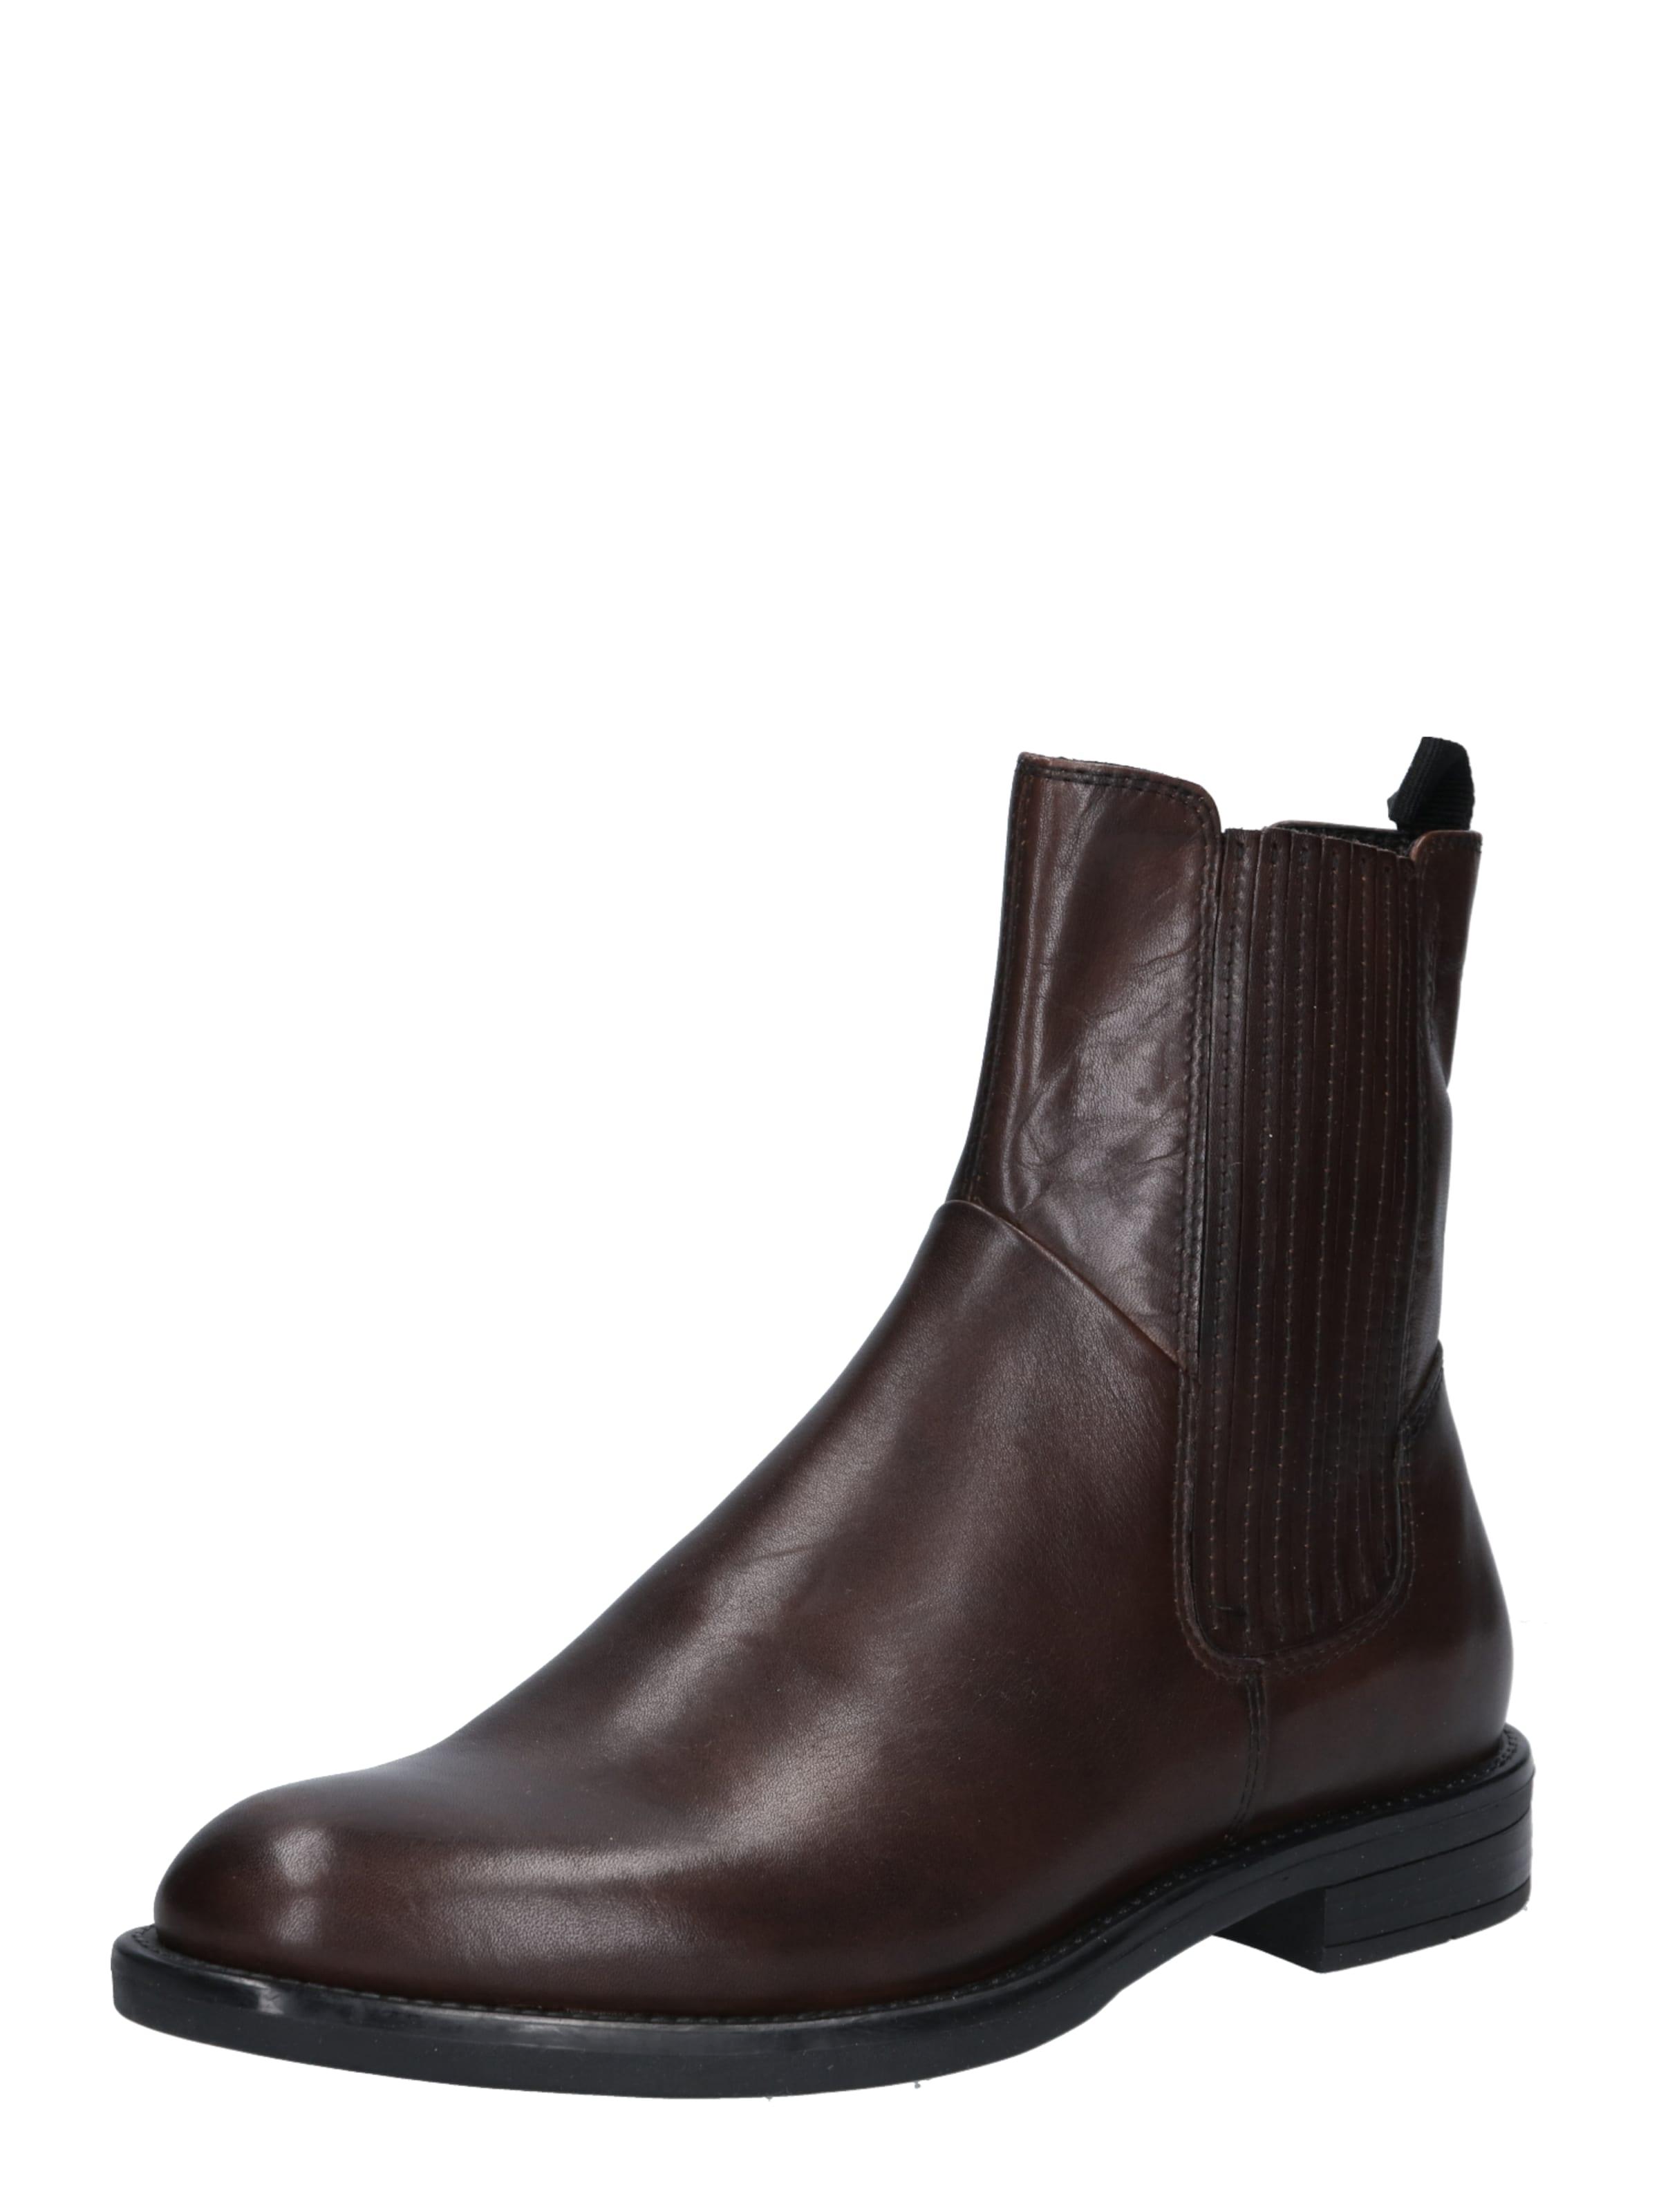 Braun Vagabond Stiefelette Shoemakers In 'amina' eE9W2YHDI